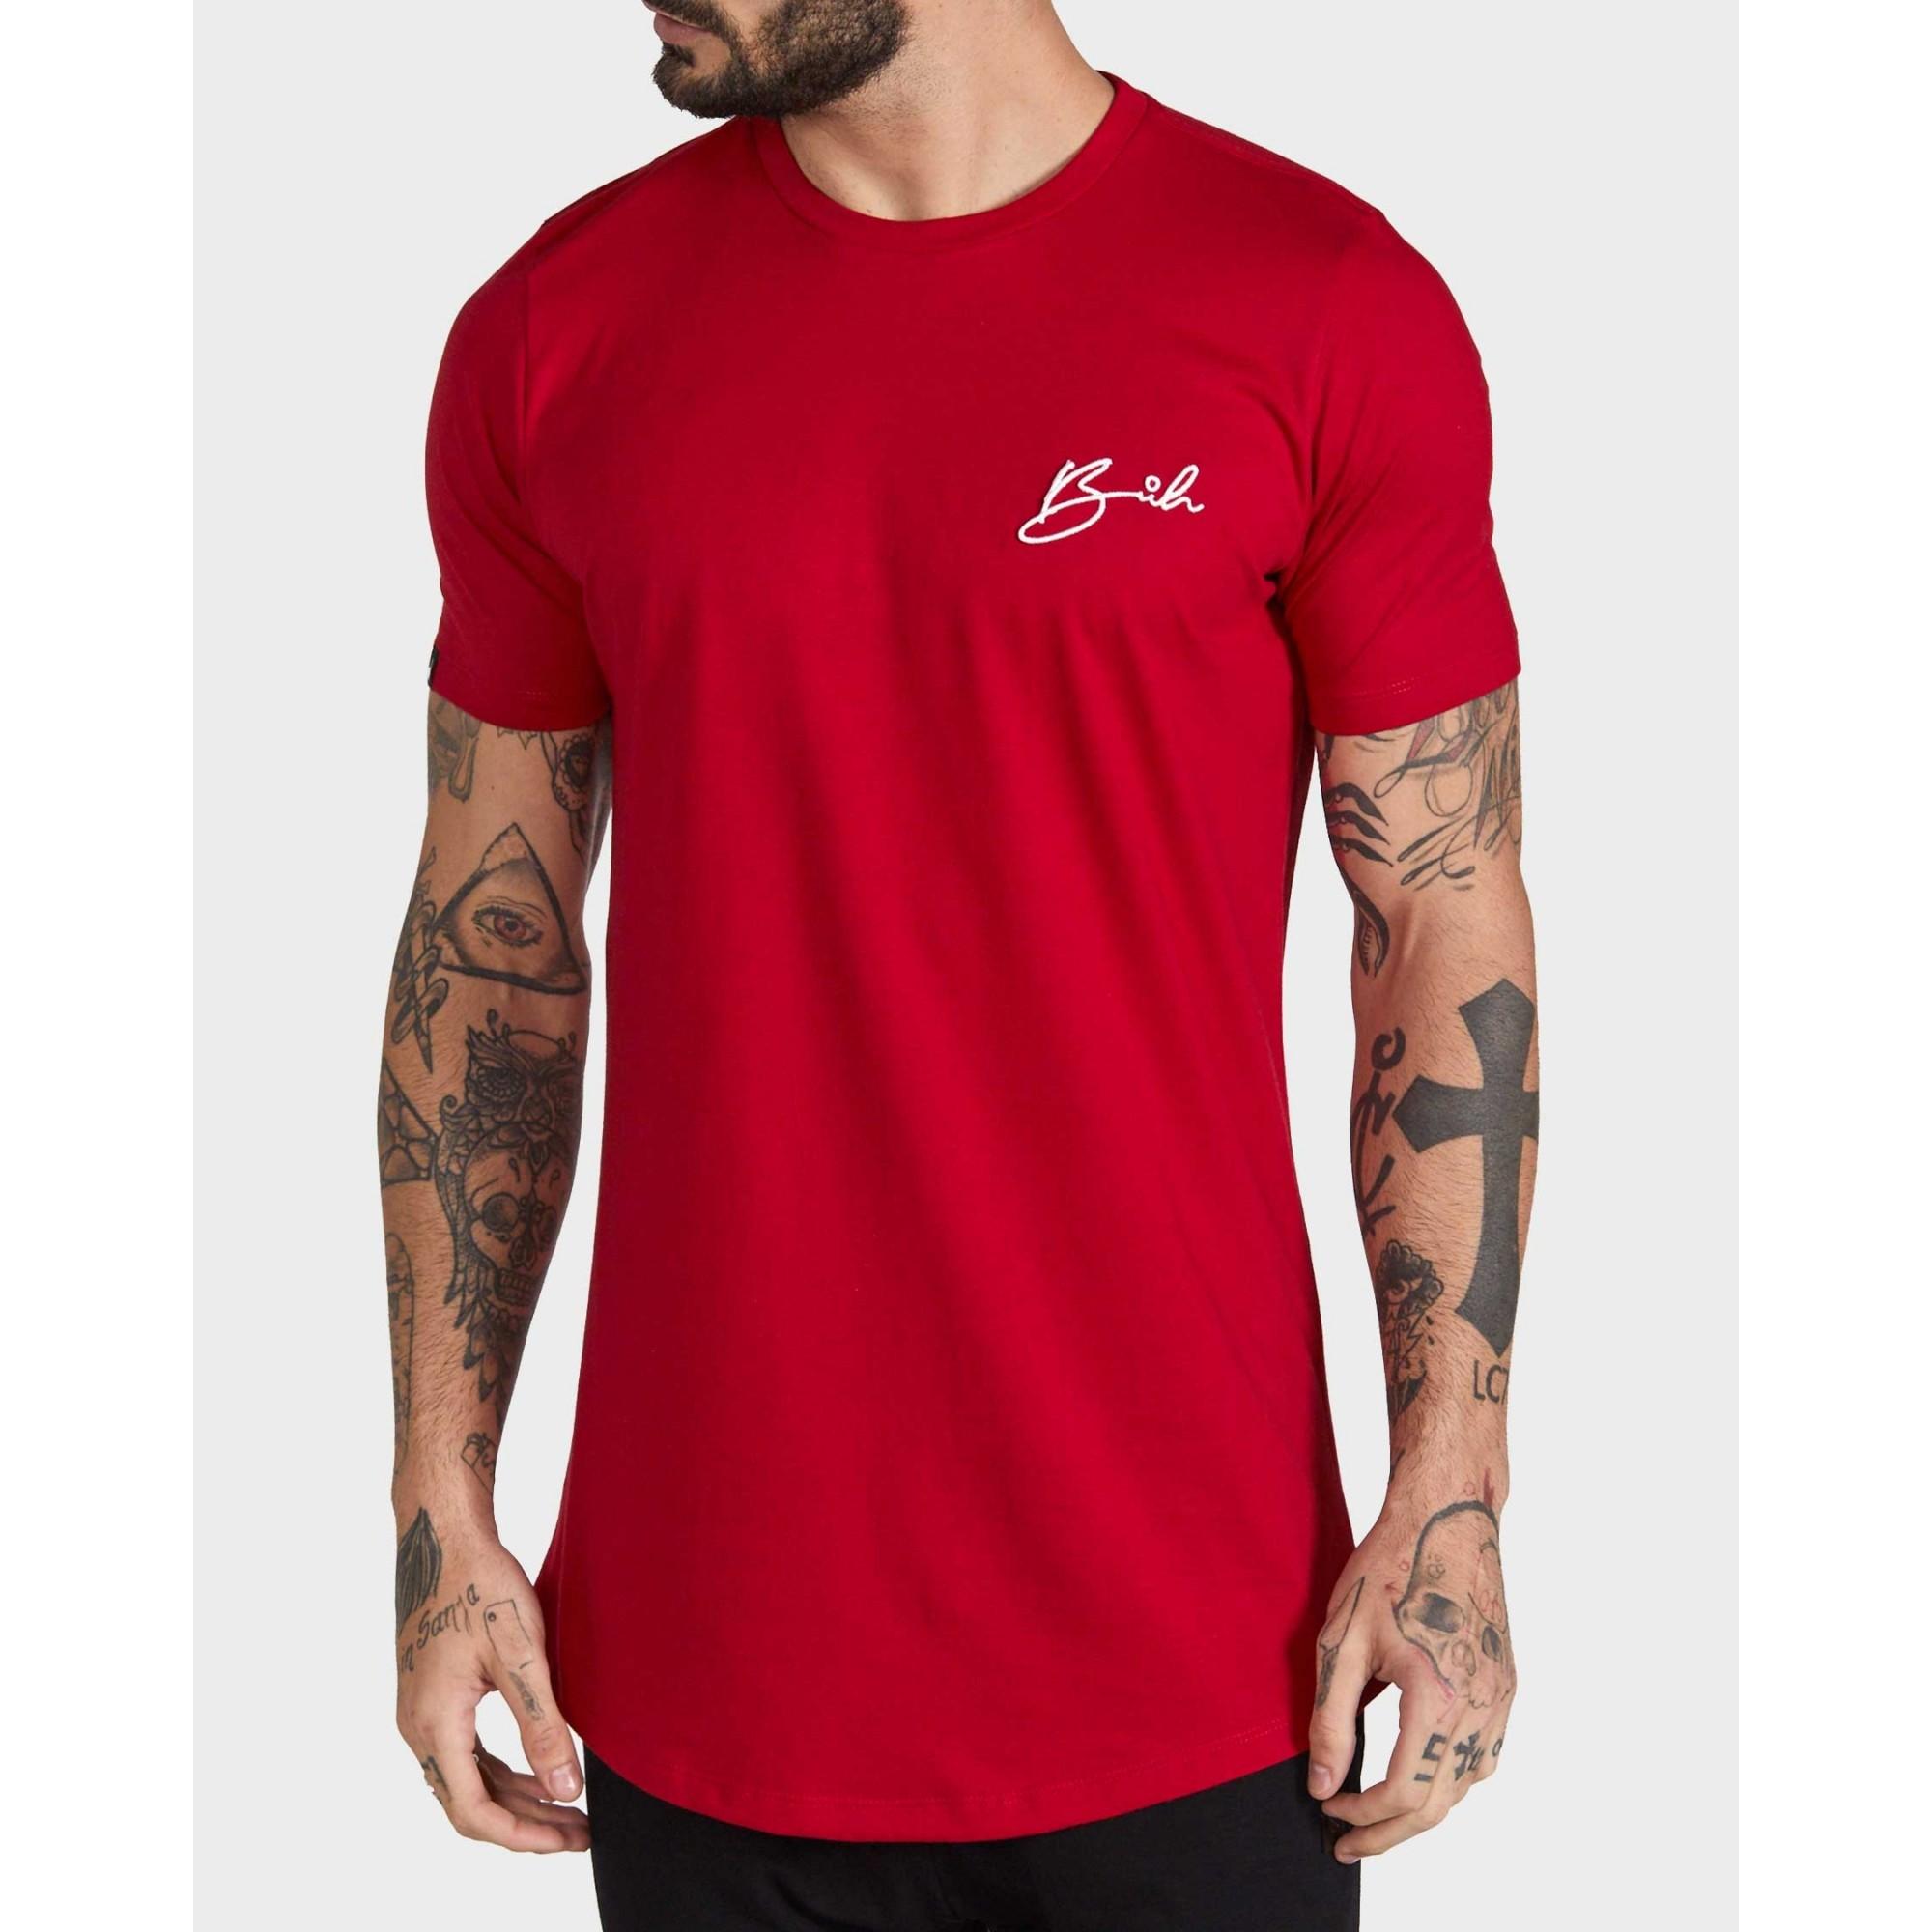 Camiseta Buh Bordado Red